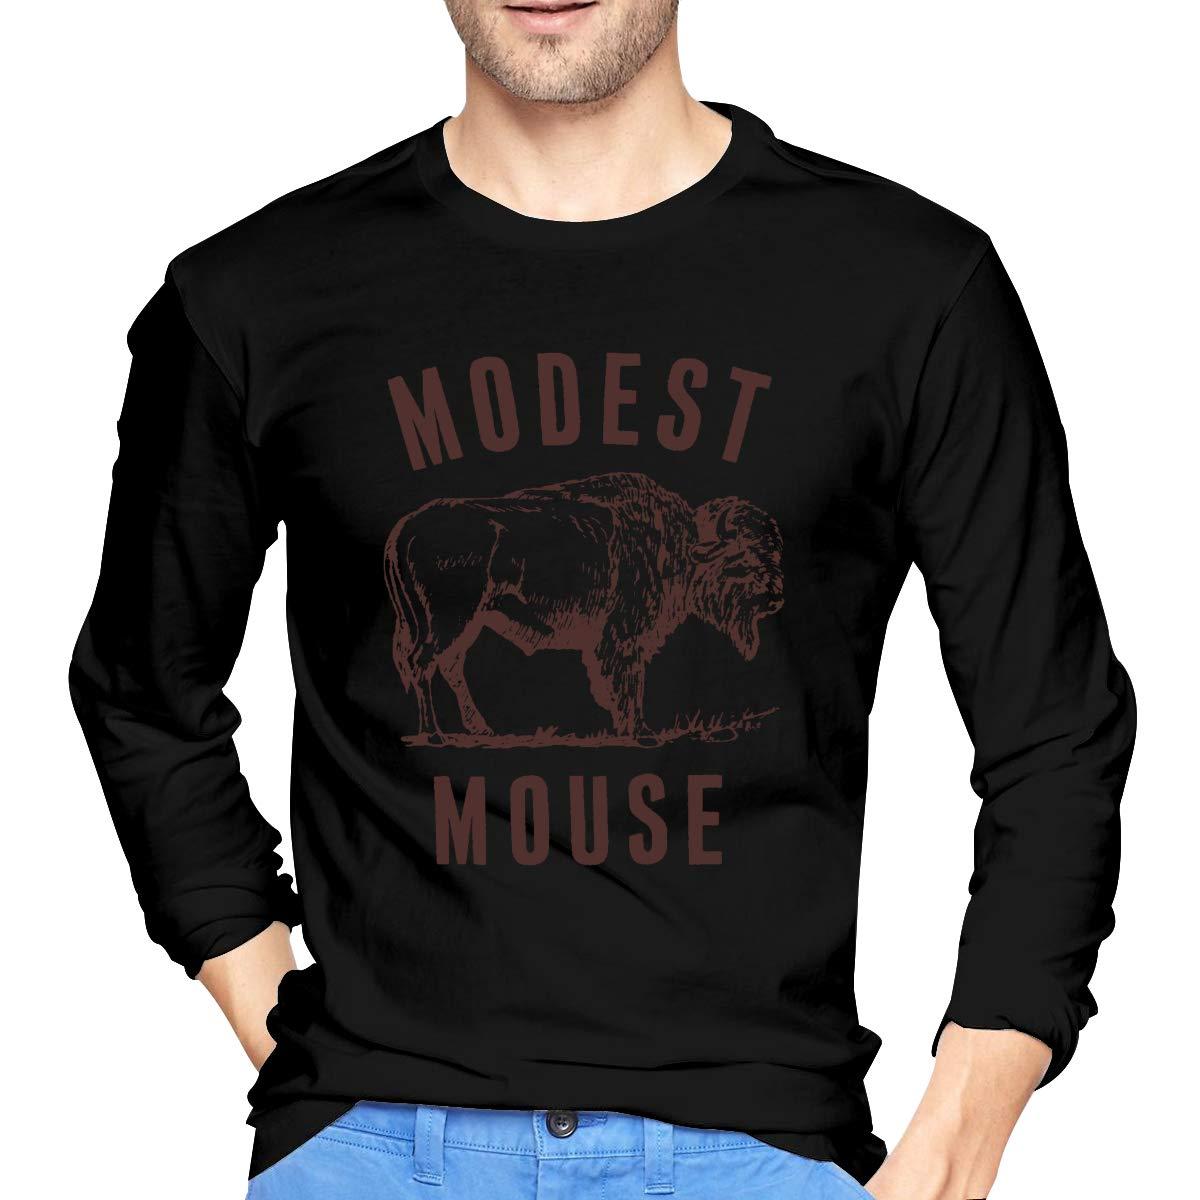 Modest Mouse S T Shirt Novelty Mans Shirts 3509